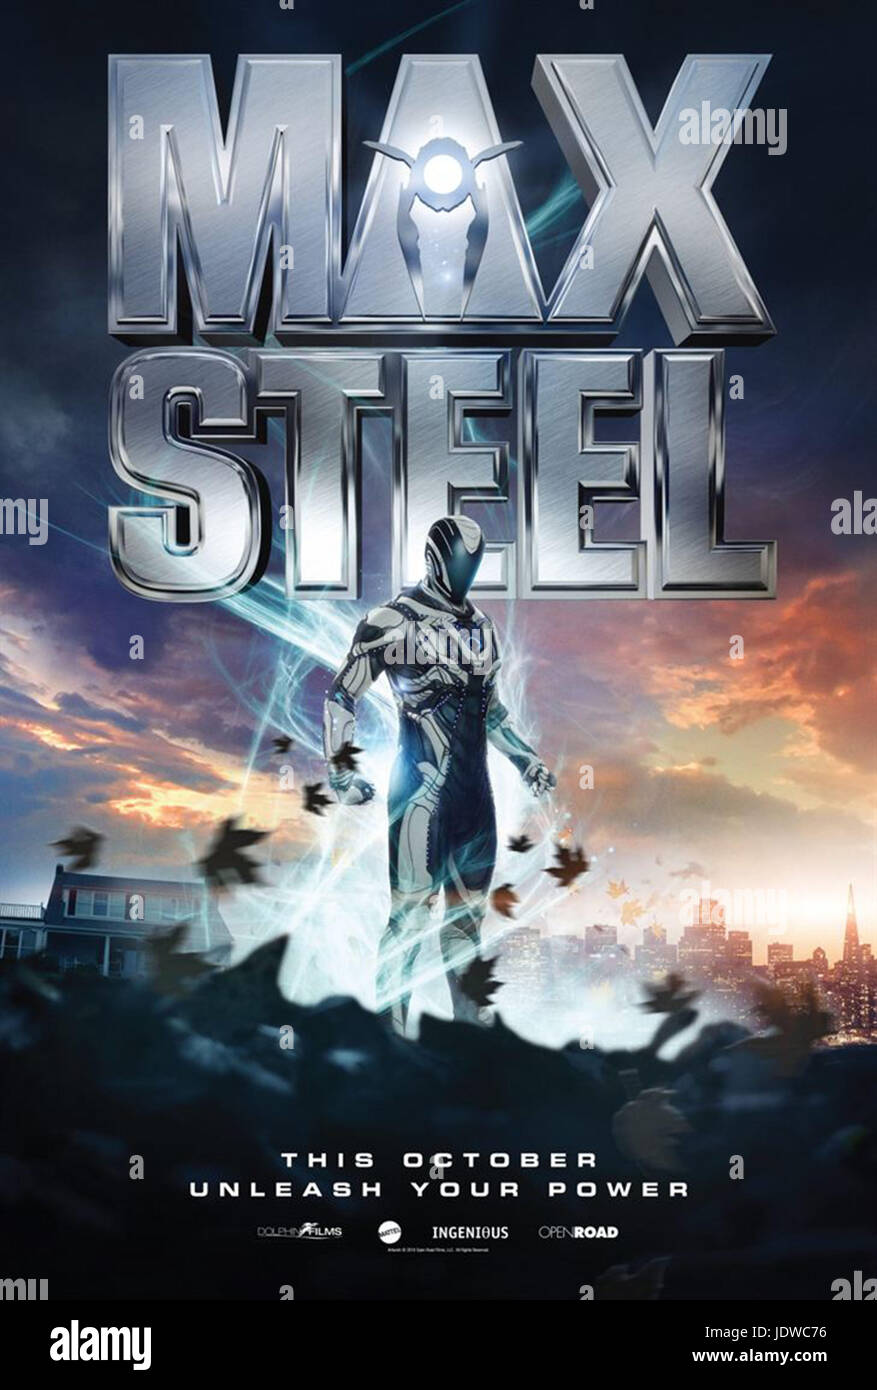 MAX STEEL (2016)  STEWART HENDLER (DIR)  OPEN ROAD FILMS/MOVIESTORE COLLECTION LTD - Stock Image